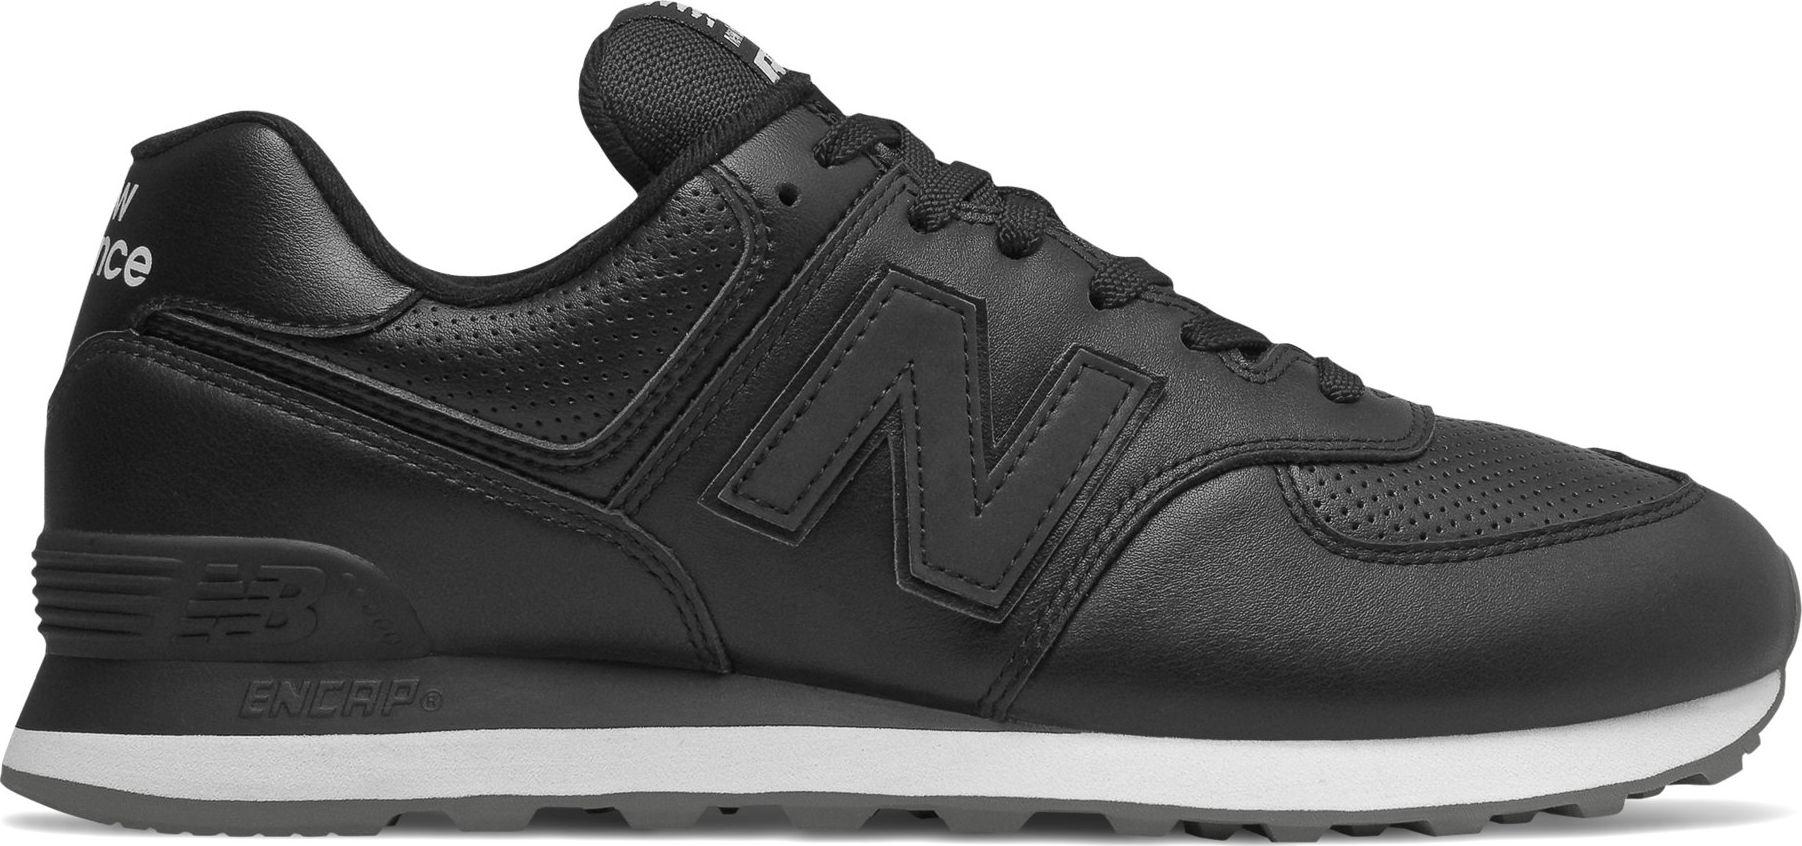 New Balance ML574 T2 Black/White 42